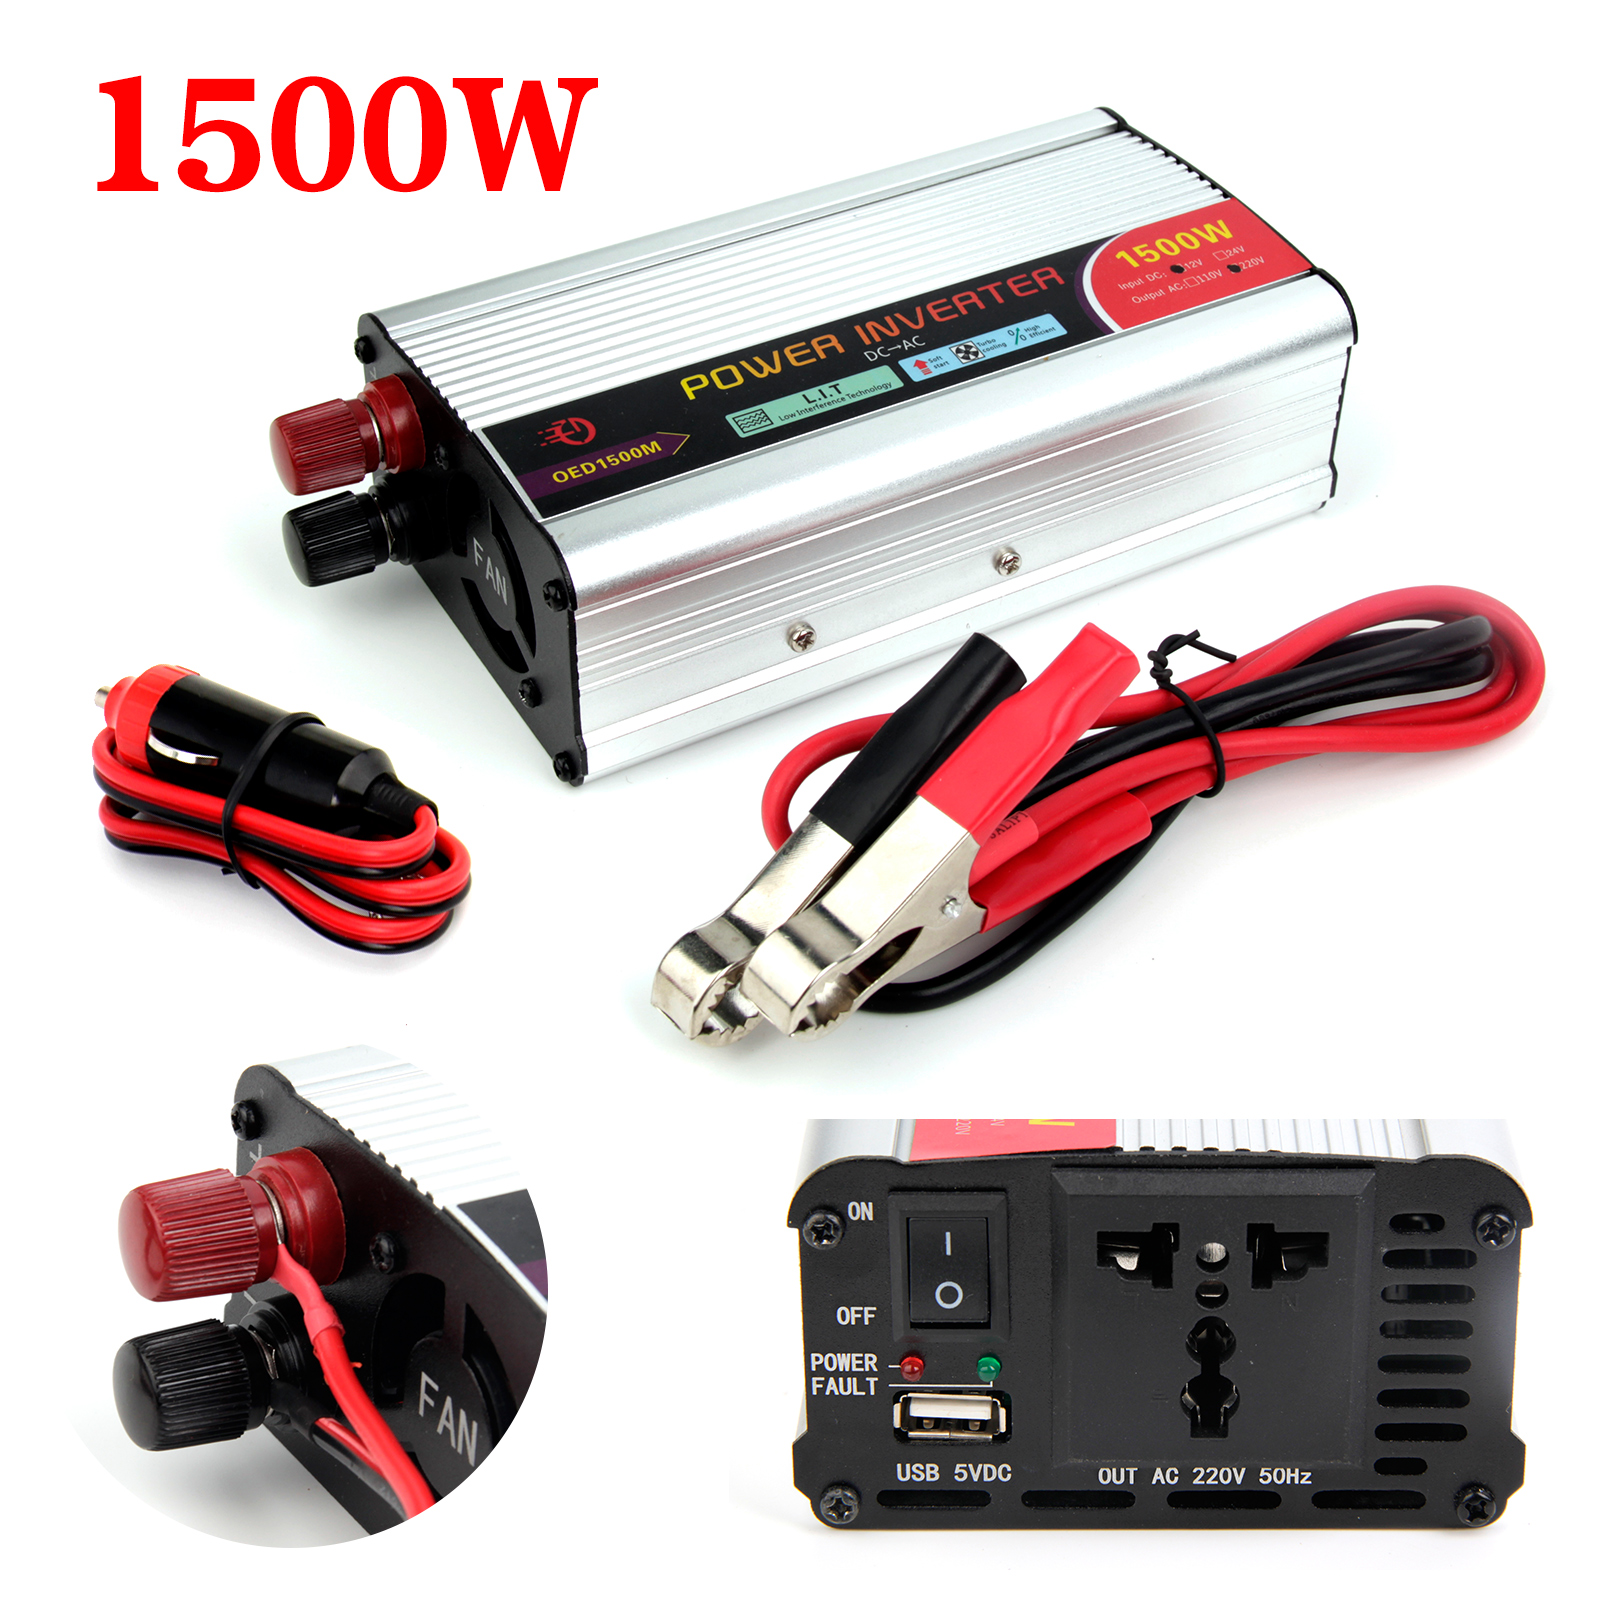 1500W//3000W Car converter power inverter DC 12V to AC 230V-240V invertor3.1A USB